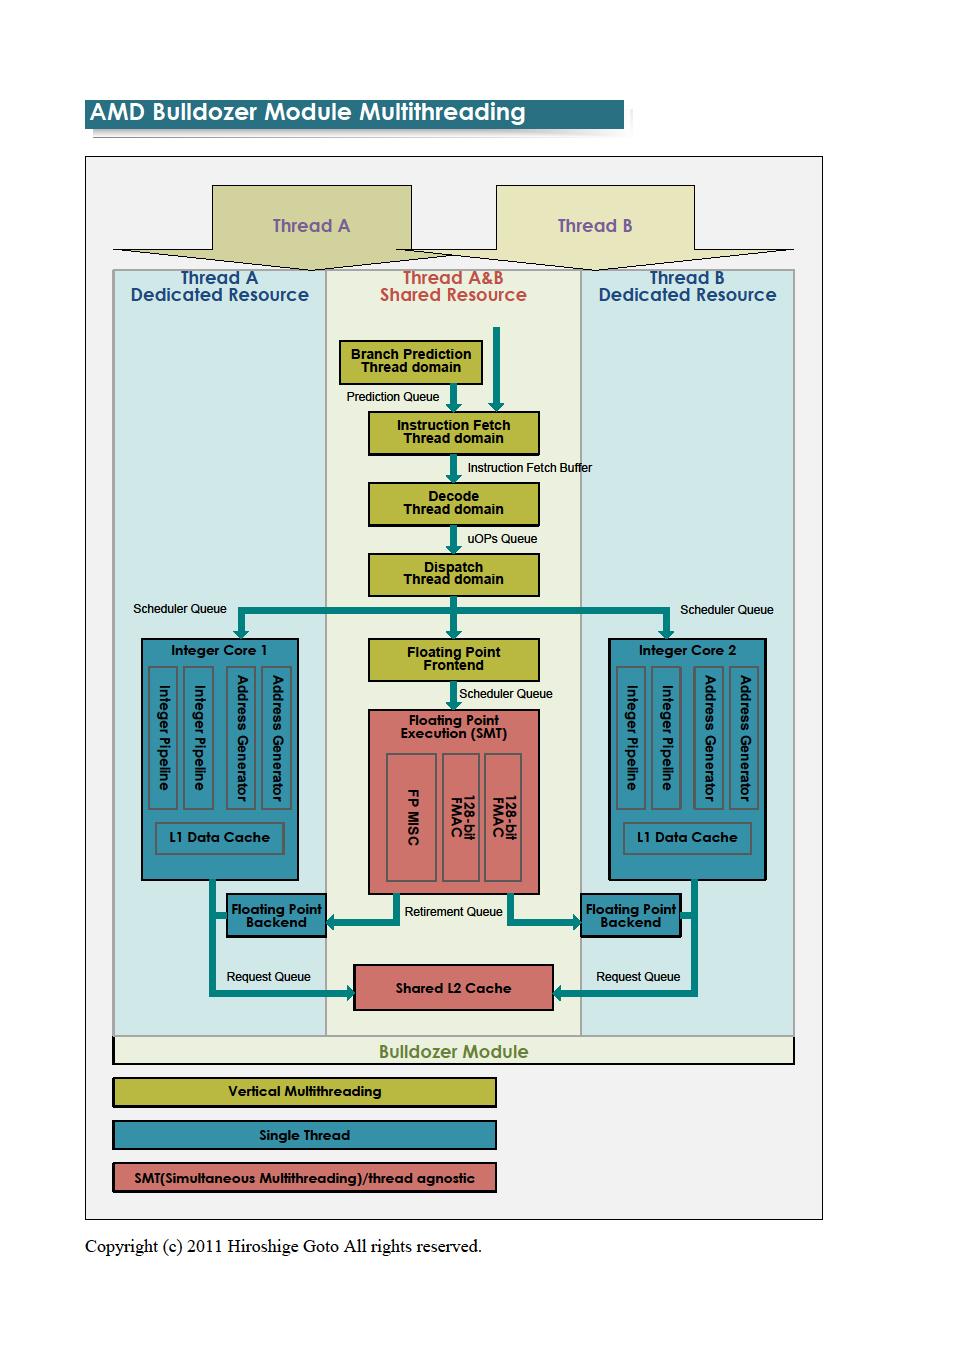 "Bulldozerのマルチスレッディング<br>PDF版は<a href=""/video/pcw/docs/450/030/p7.pdf"">こちら</a>"